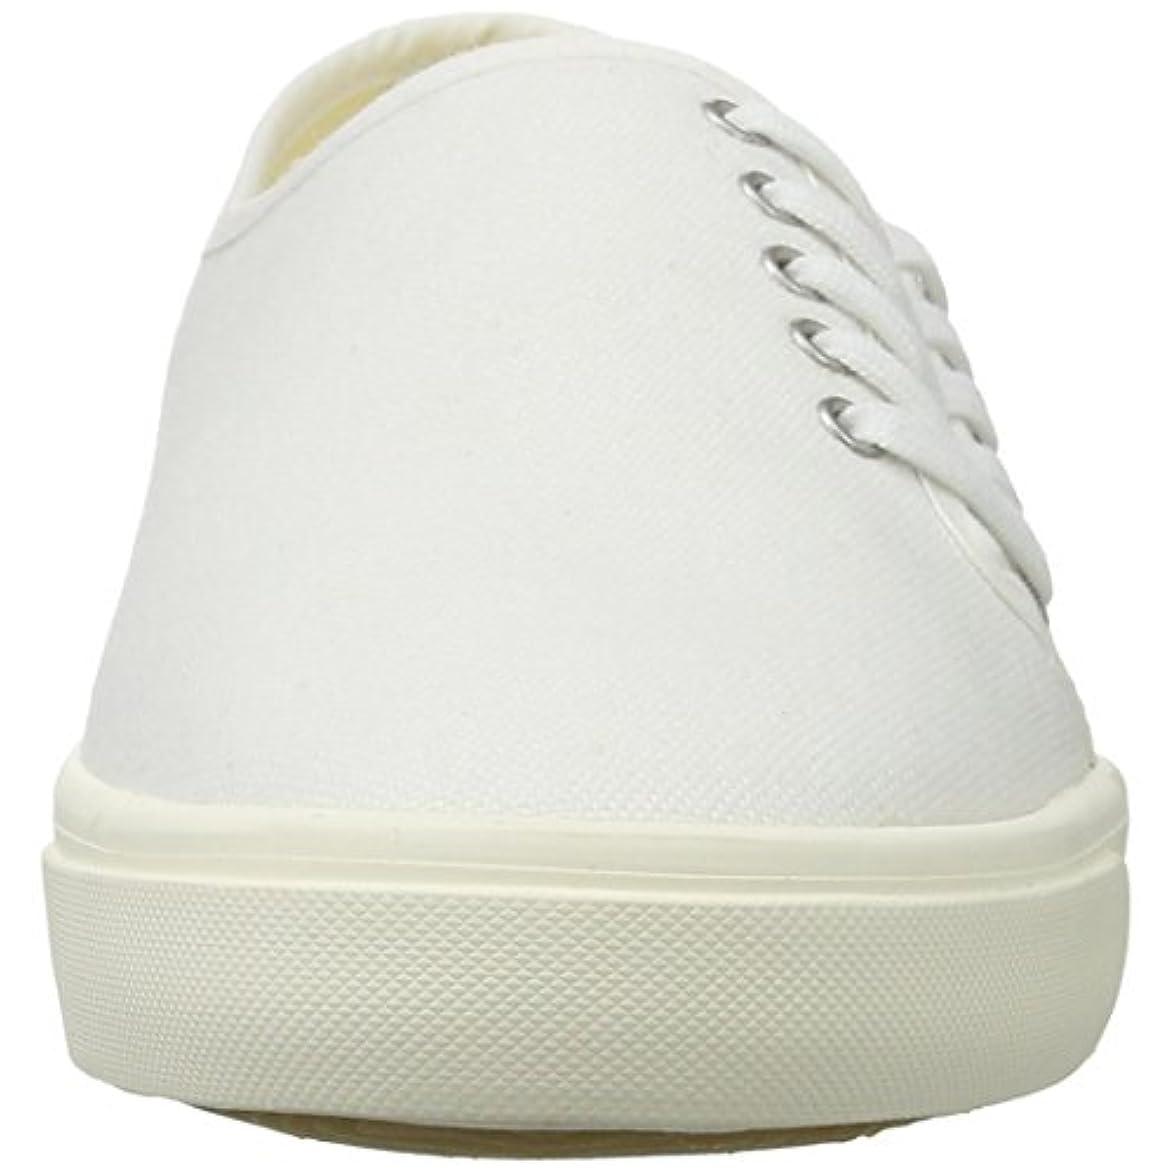 Napapijri Mia Shoes Woman Bright White Eu 37